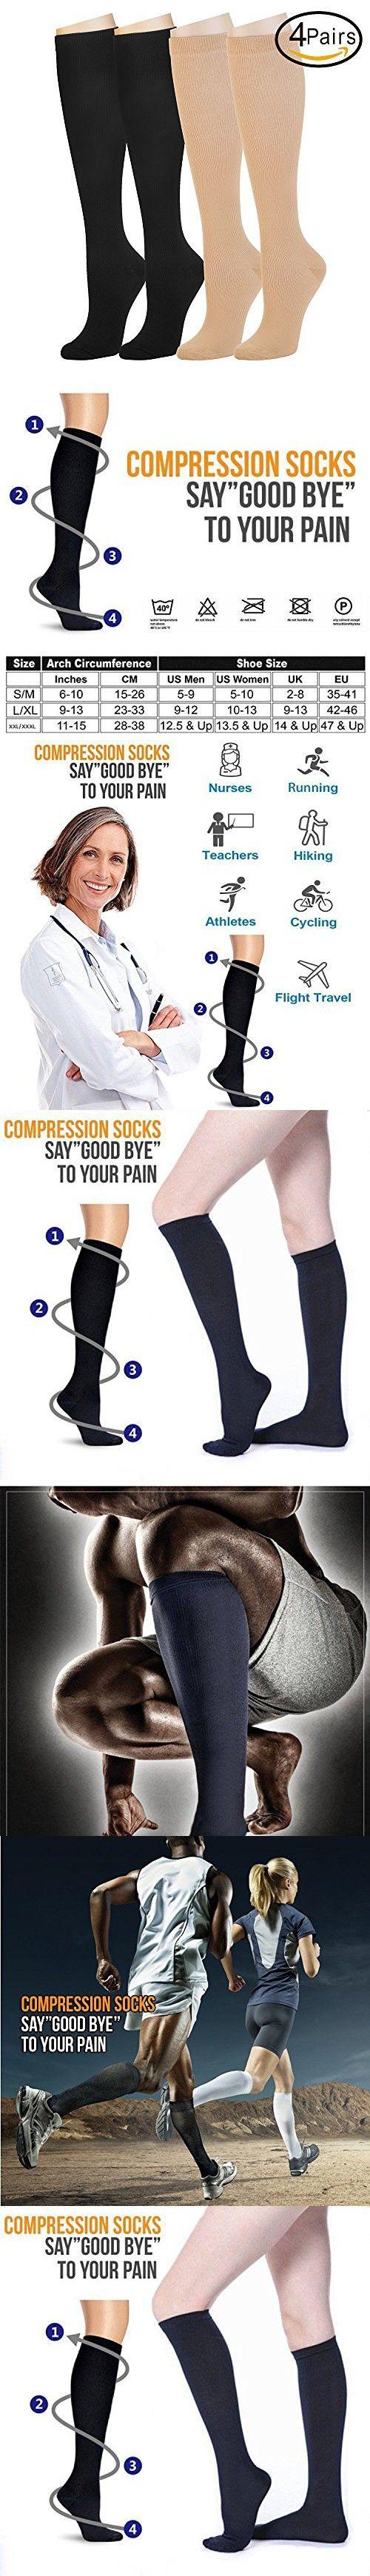 4 Pairs Compression Socks For Women and Men -- Best Medical, Nursing, Athletic, Edema, Diabetic,Varicose Veins , Maternity, Travel, Flight Socks - Running, Fitness -15-20mmHg. (S/M, Assort2)